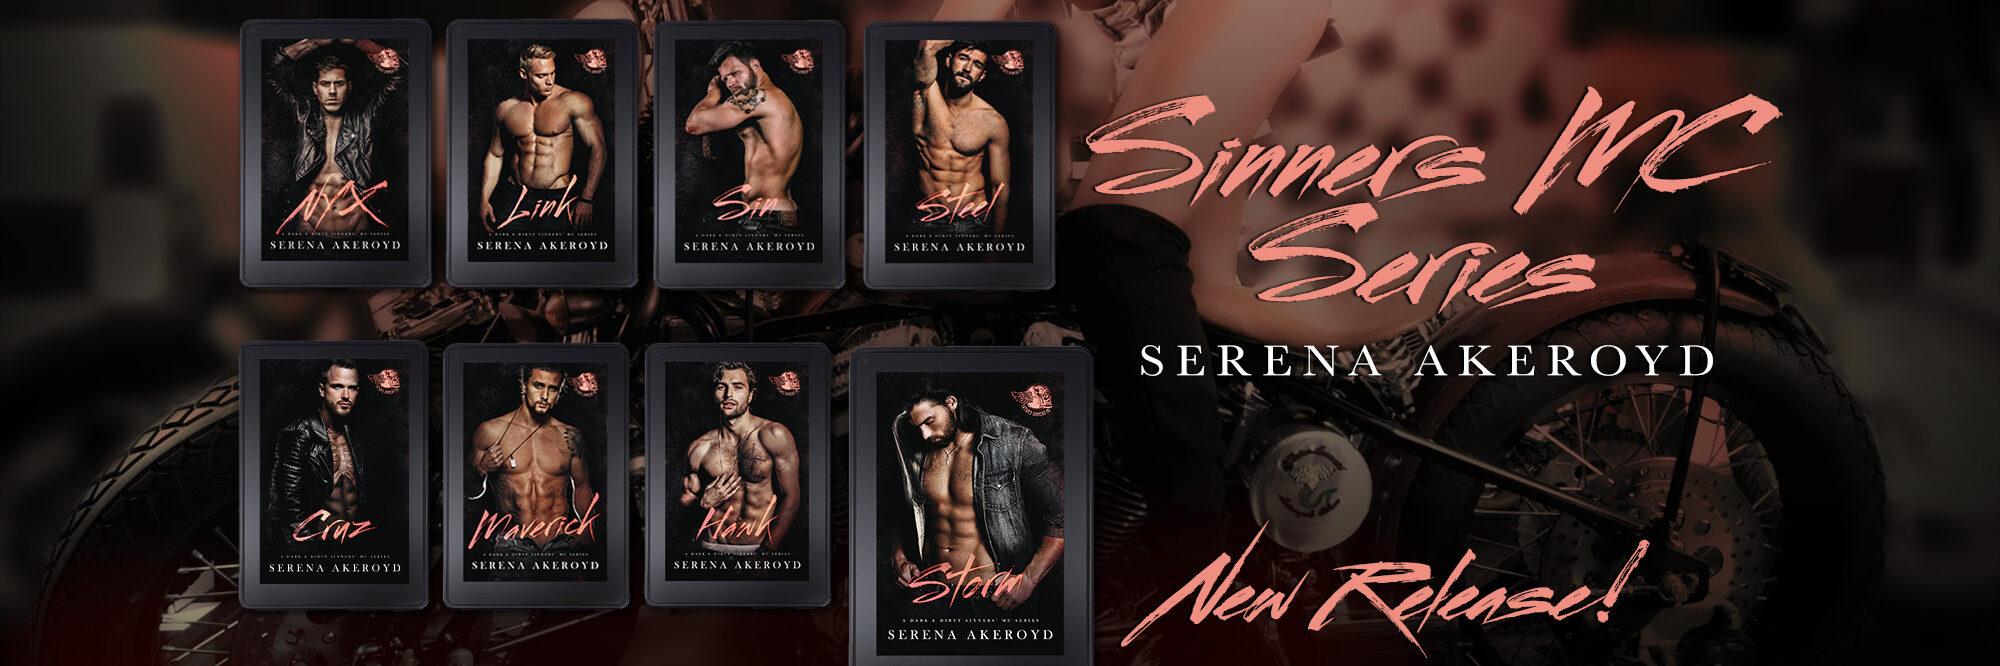 Maverick - Satan's Sinners MC by Serena Akeroyd